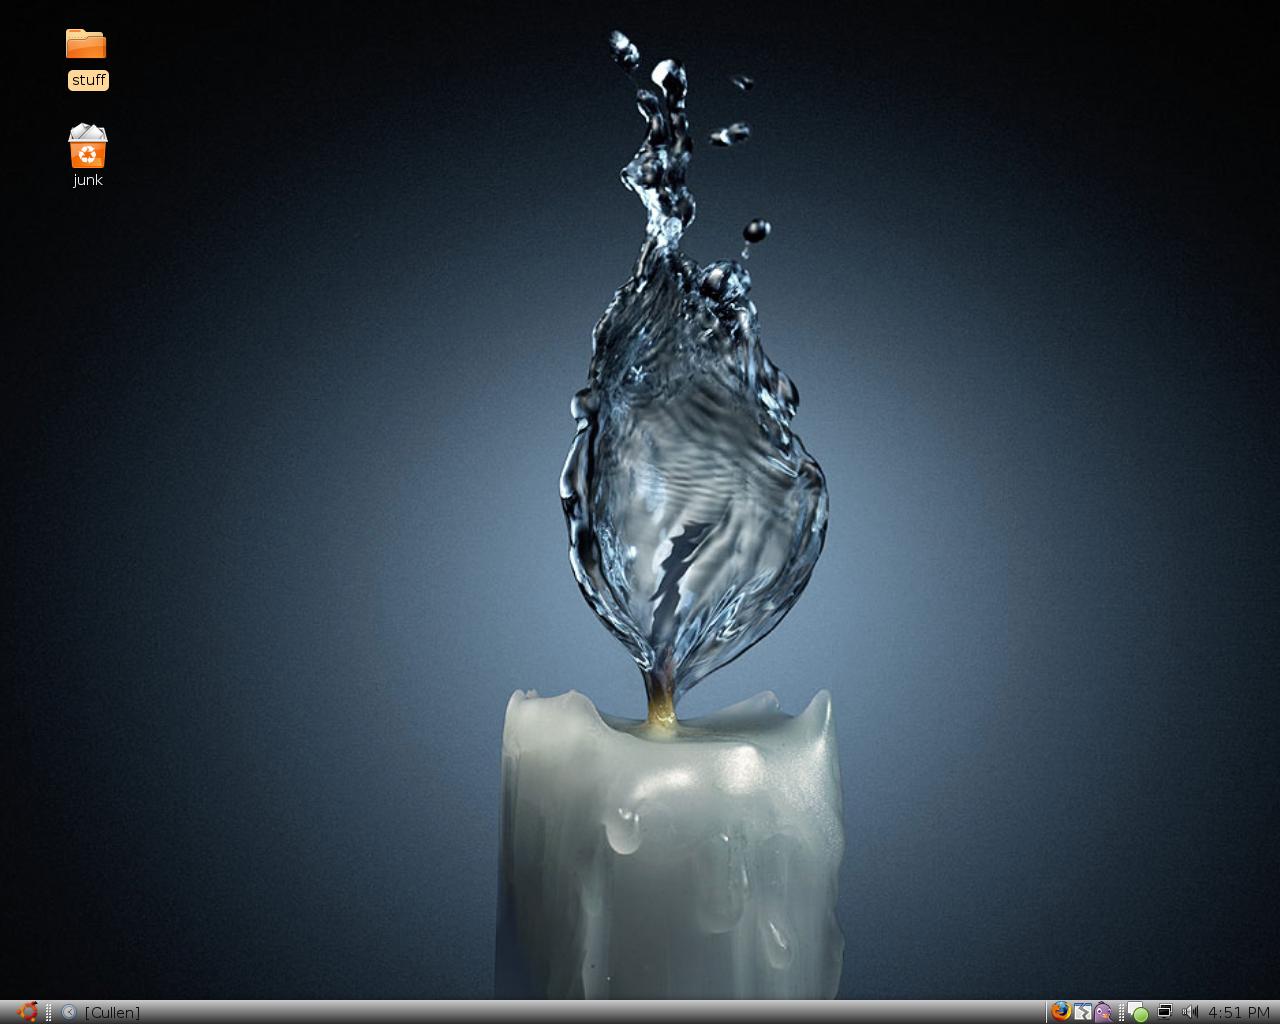 upgrade from windows to ubuntu